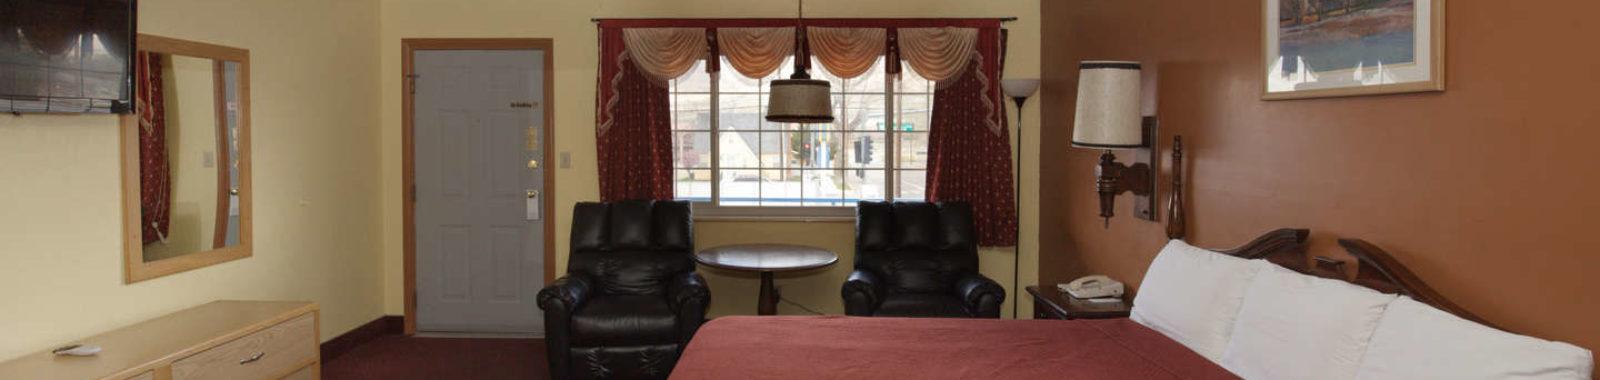 California King Room in Winnemucca